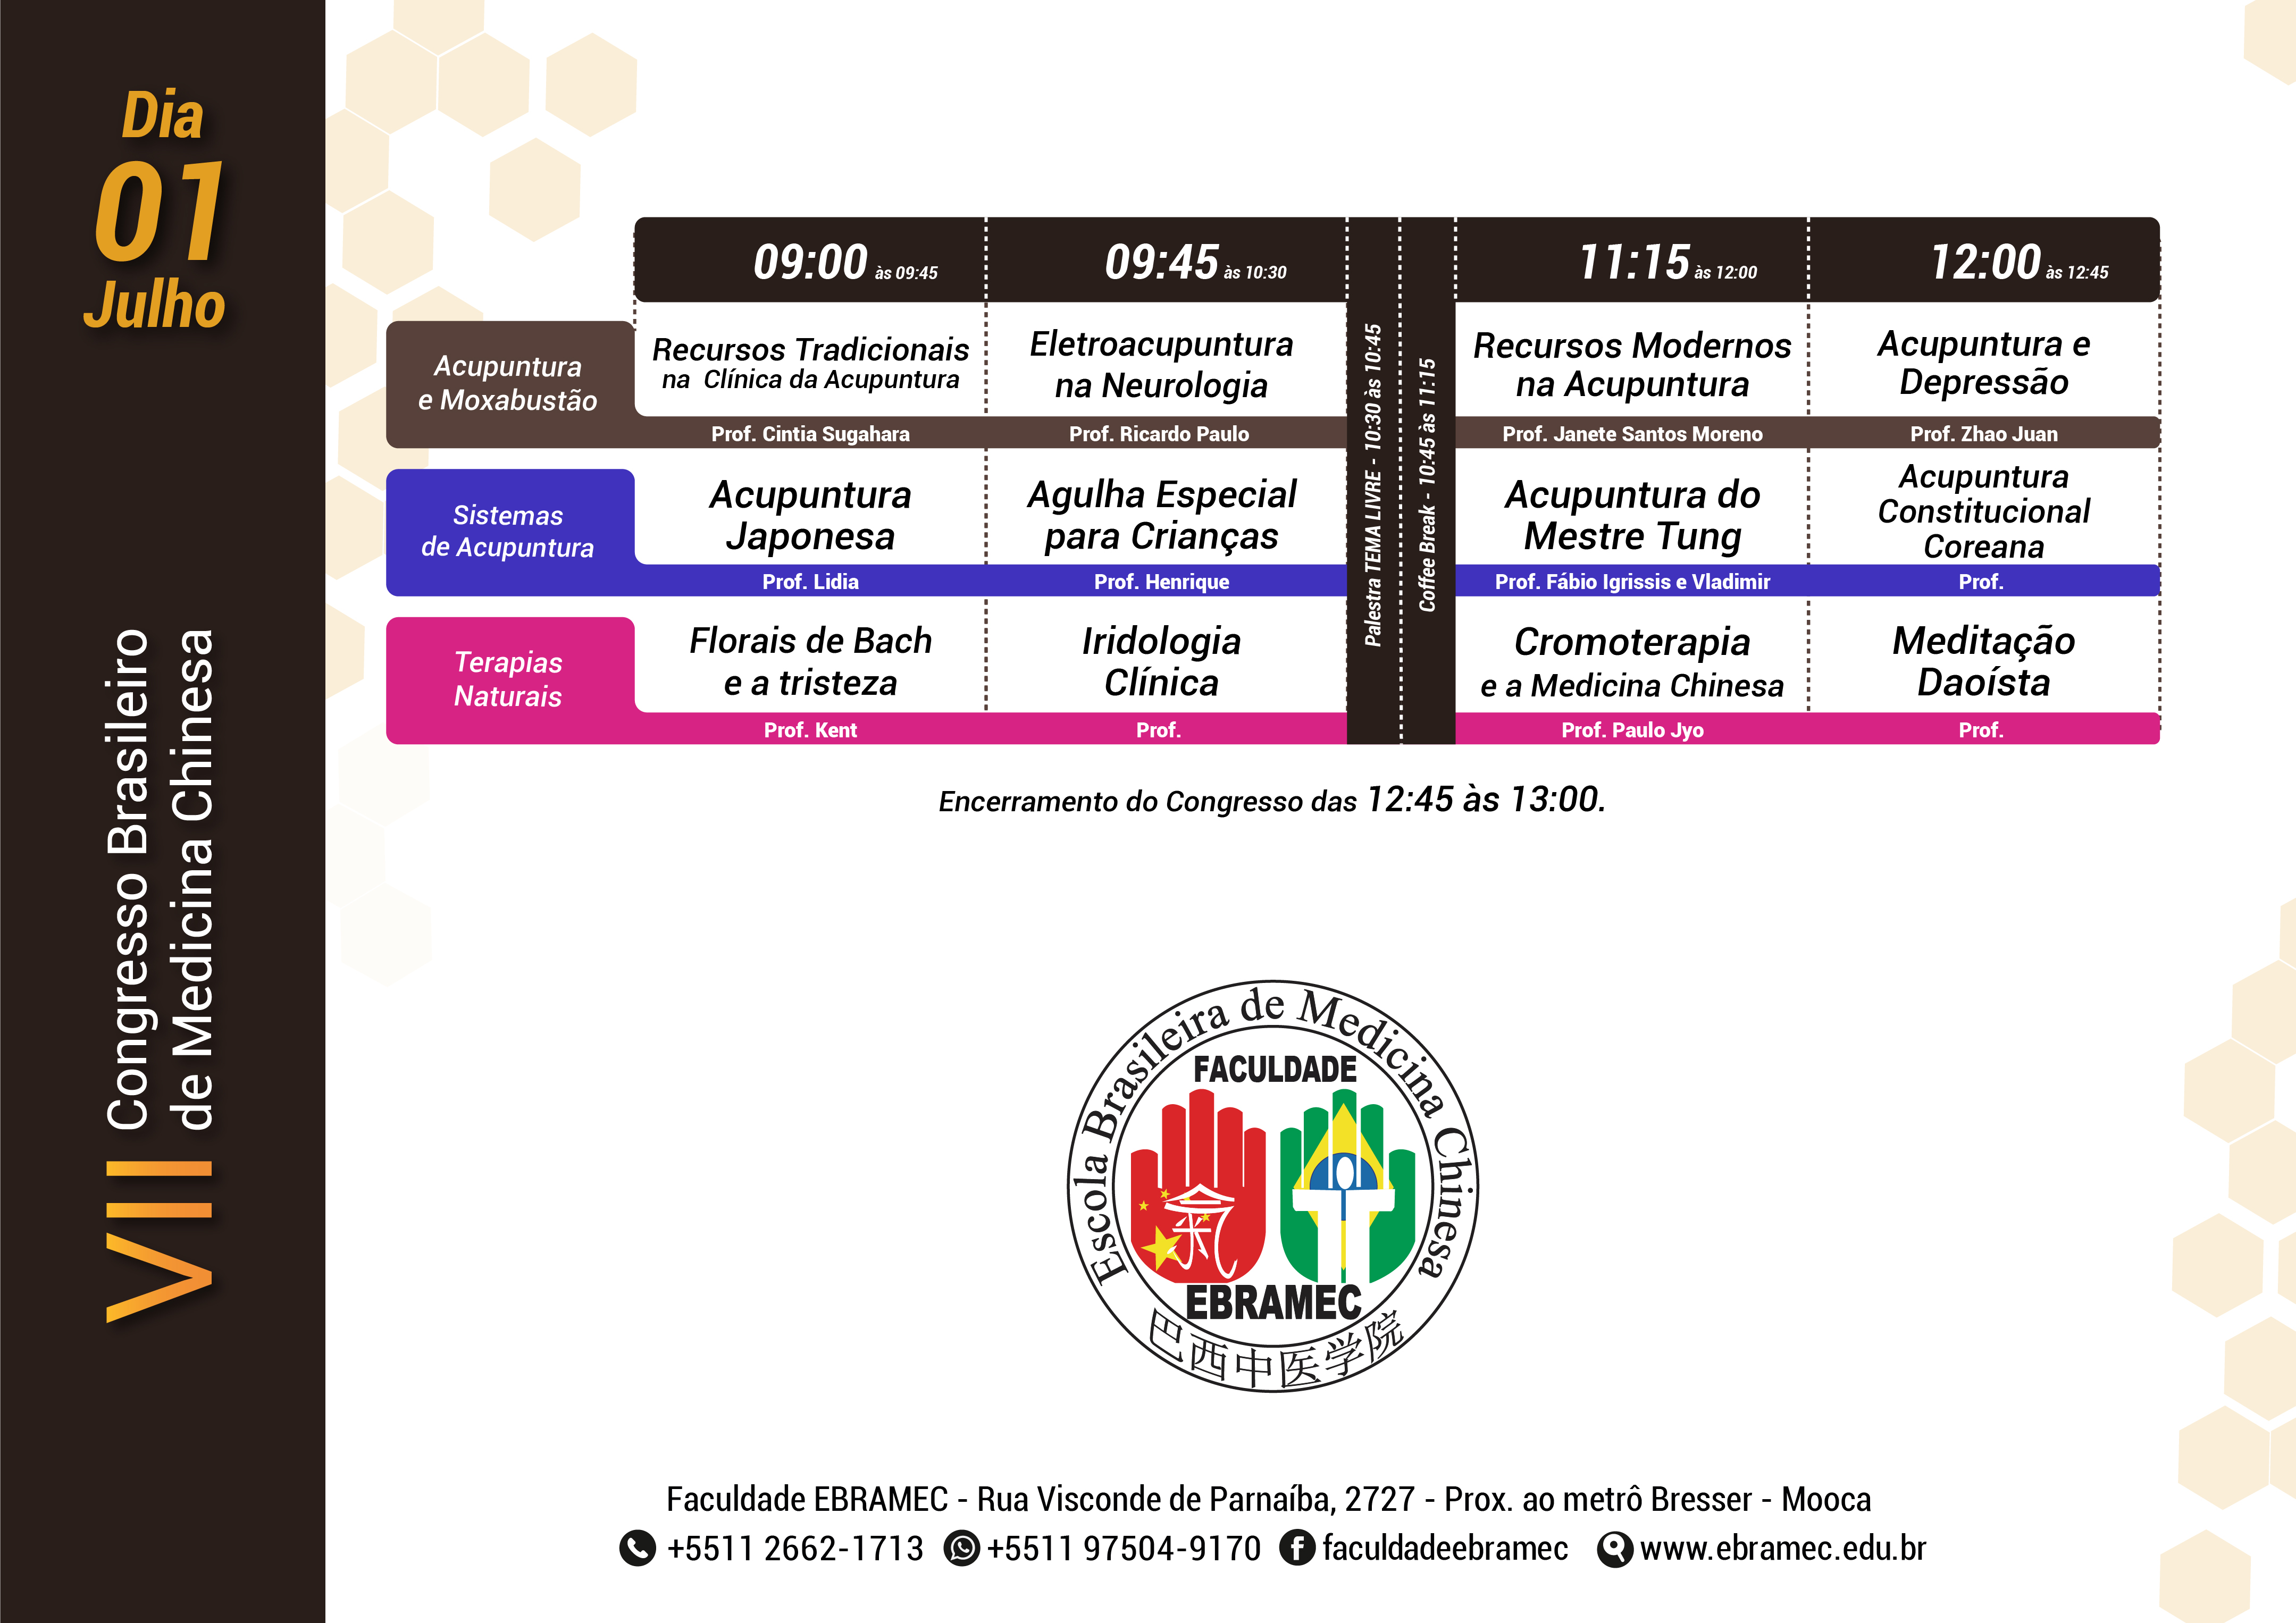 VII Congresso Brasileiro de Medicina Chinesa | Dia 2